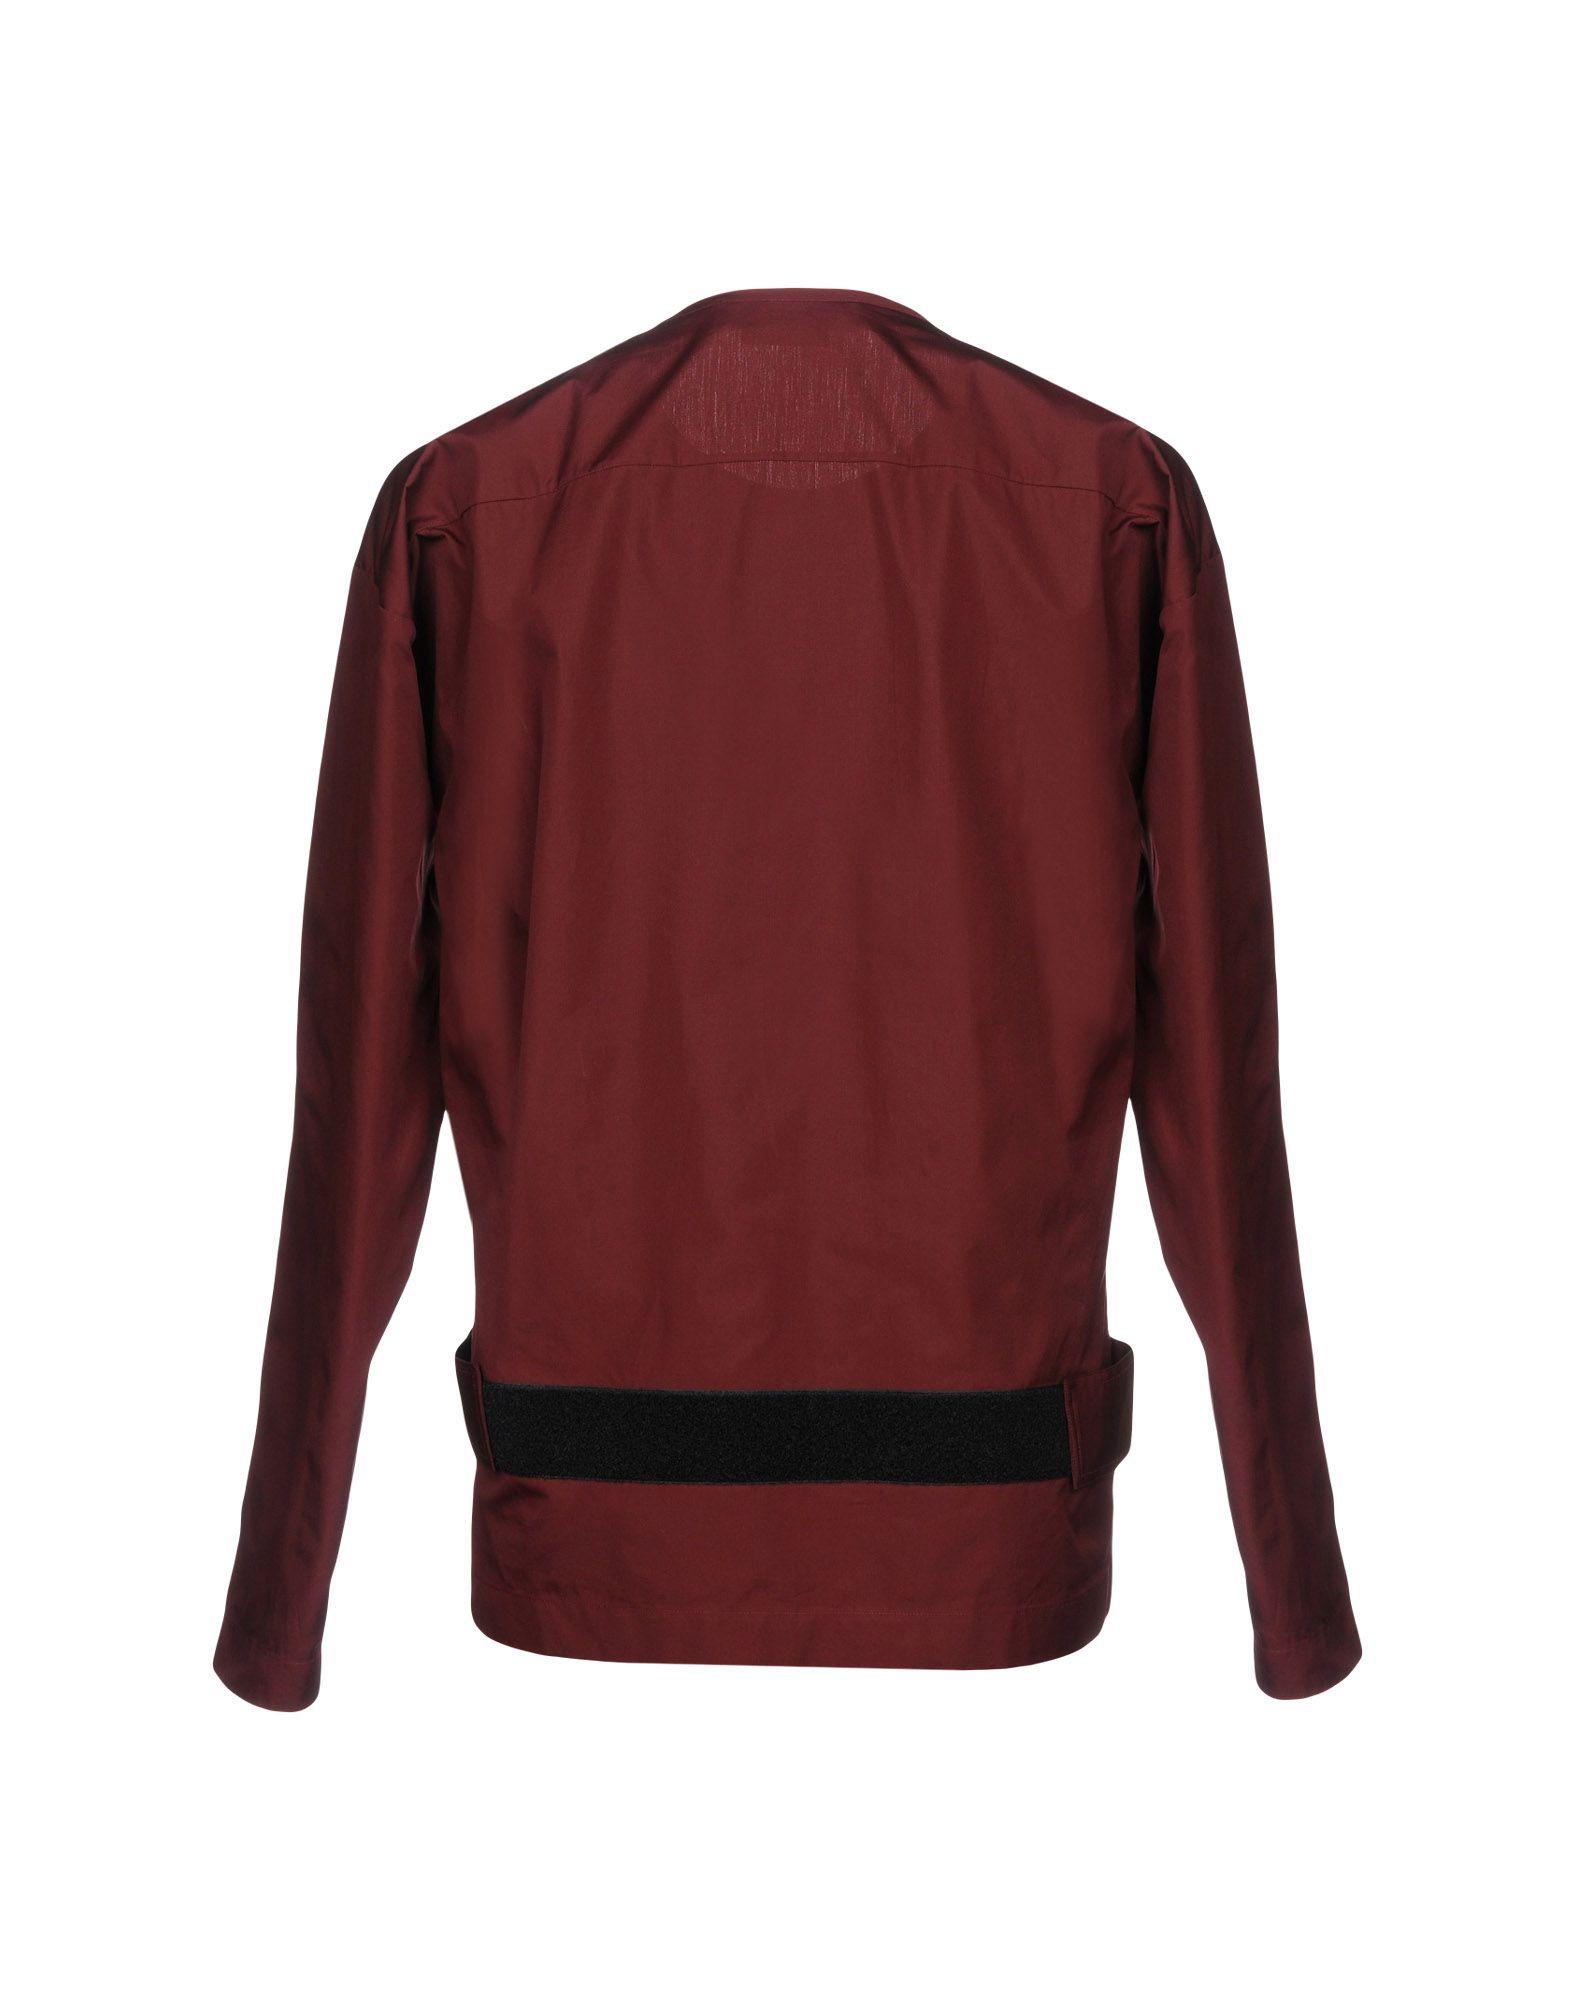 Camicia Tinta Unita Unita Unita Marni Uomo - 38722635SV 1332f5